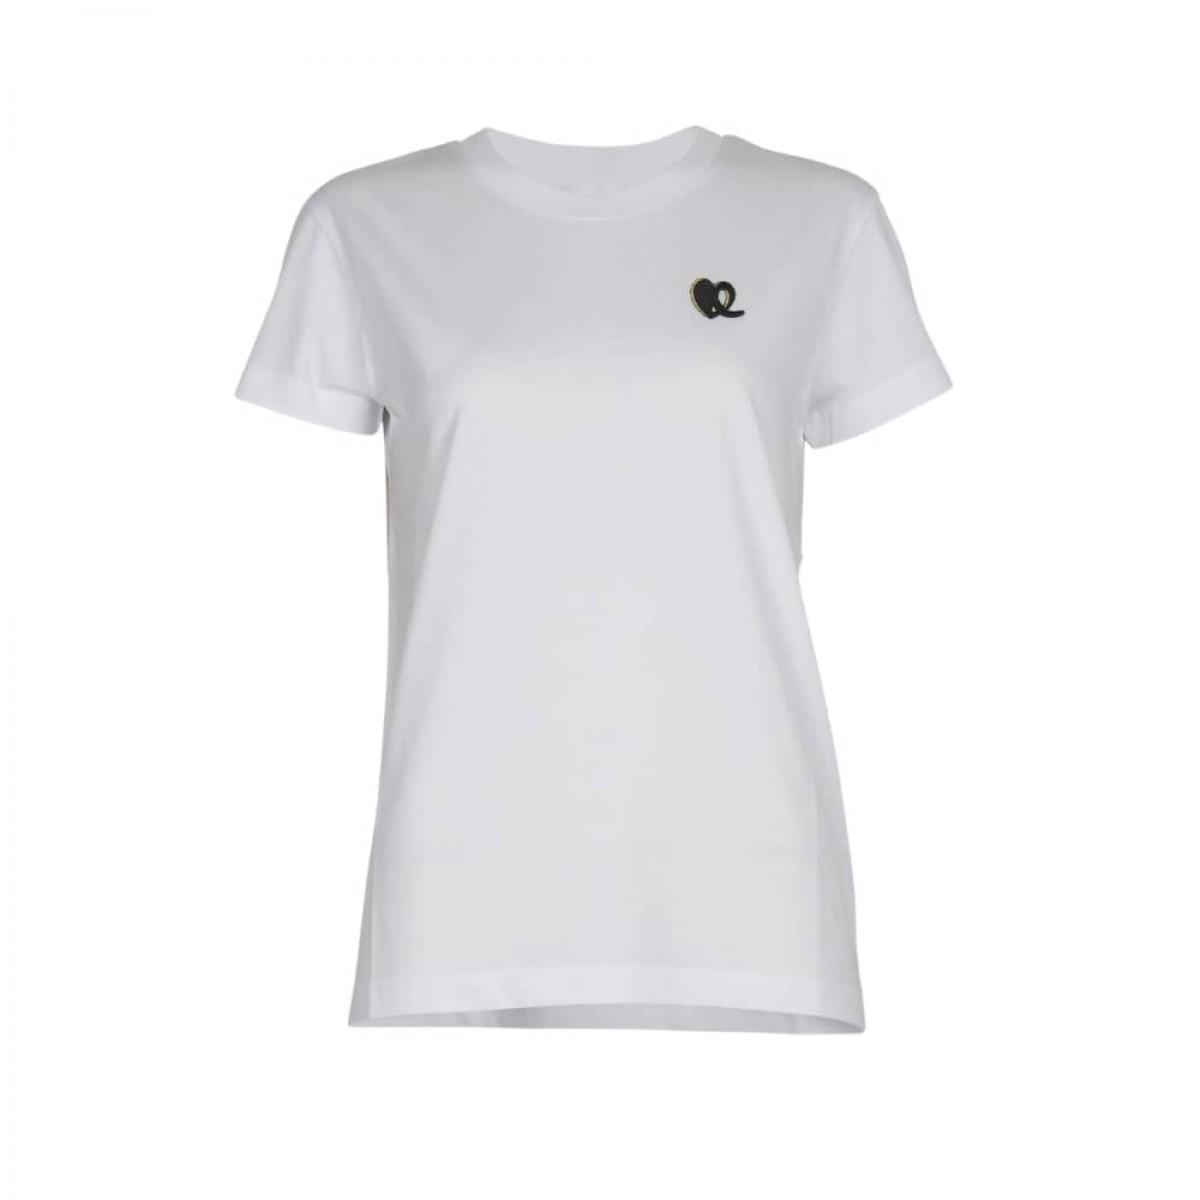 cara heart t-shirt - white - front